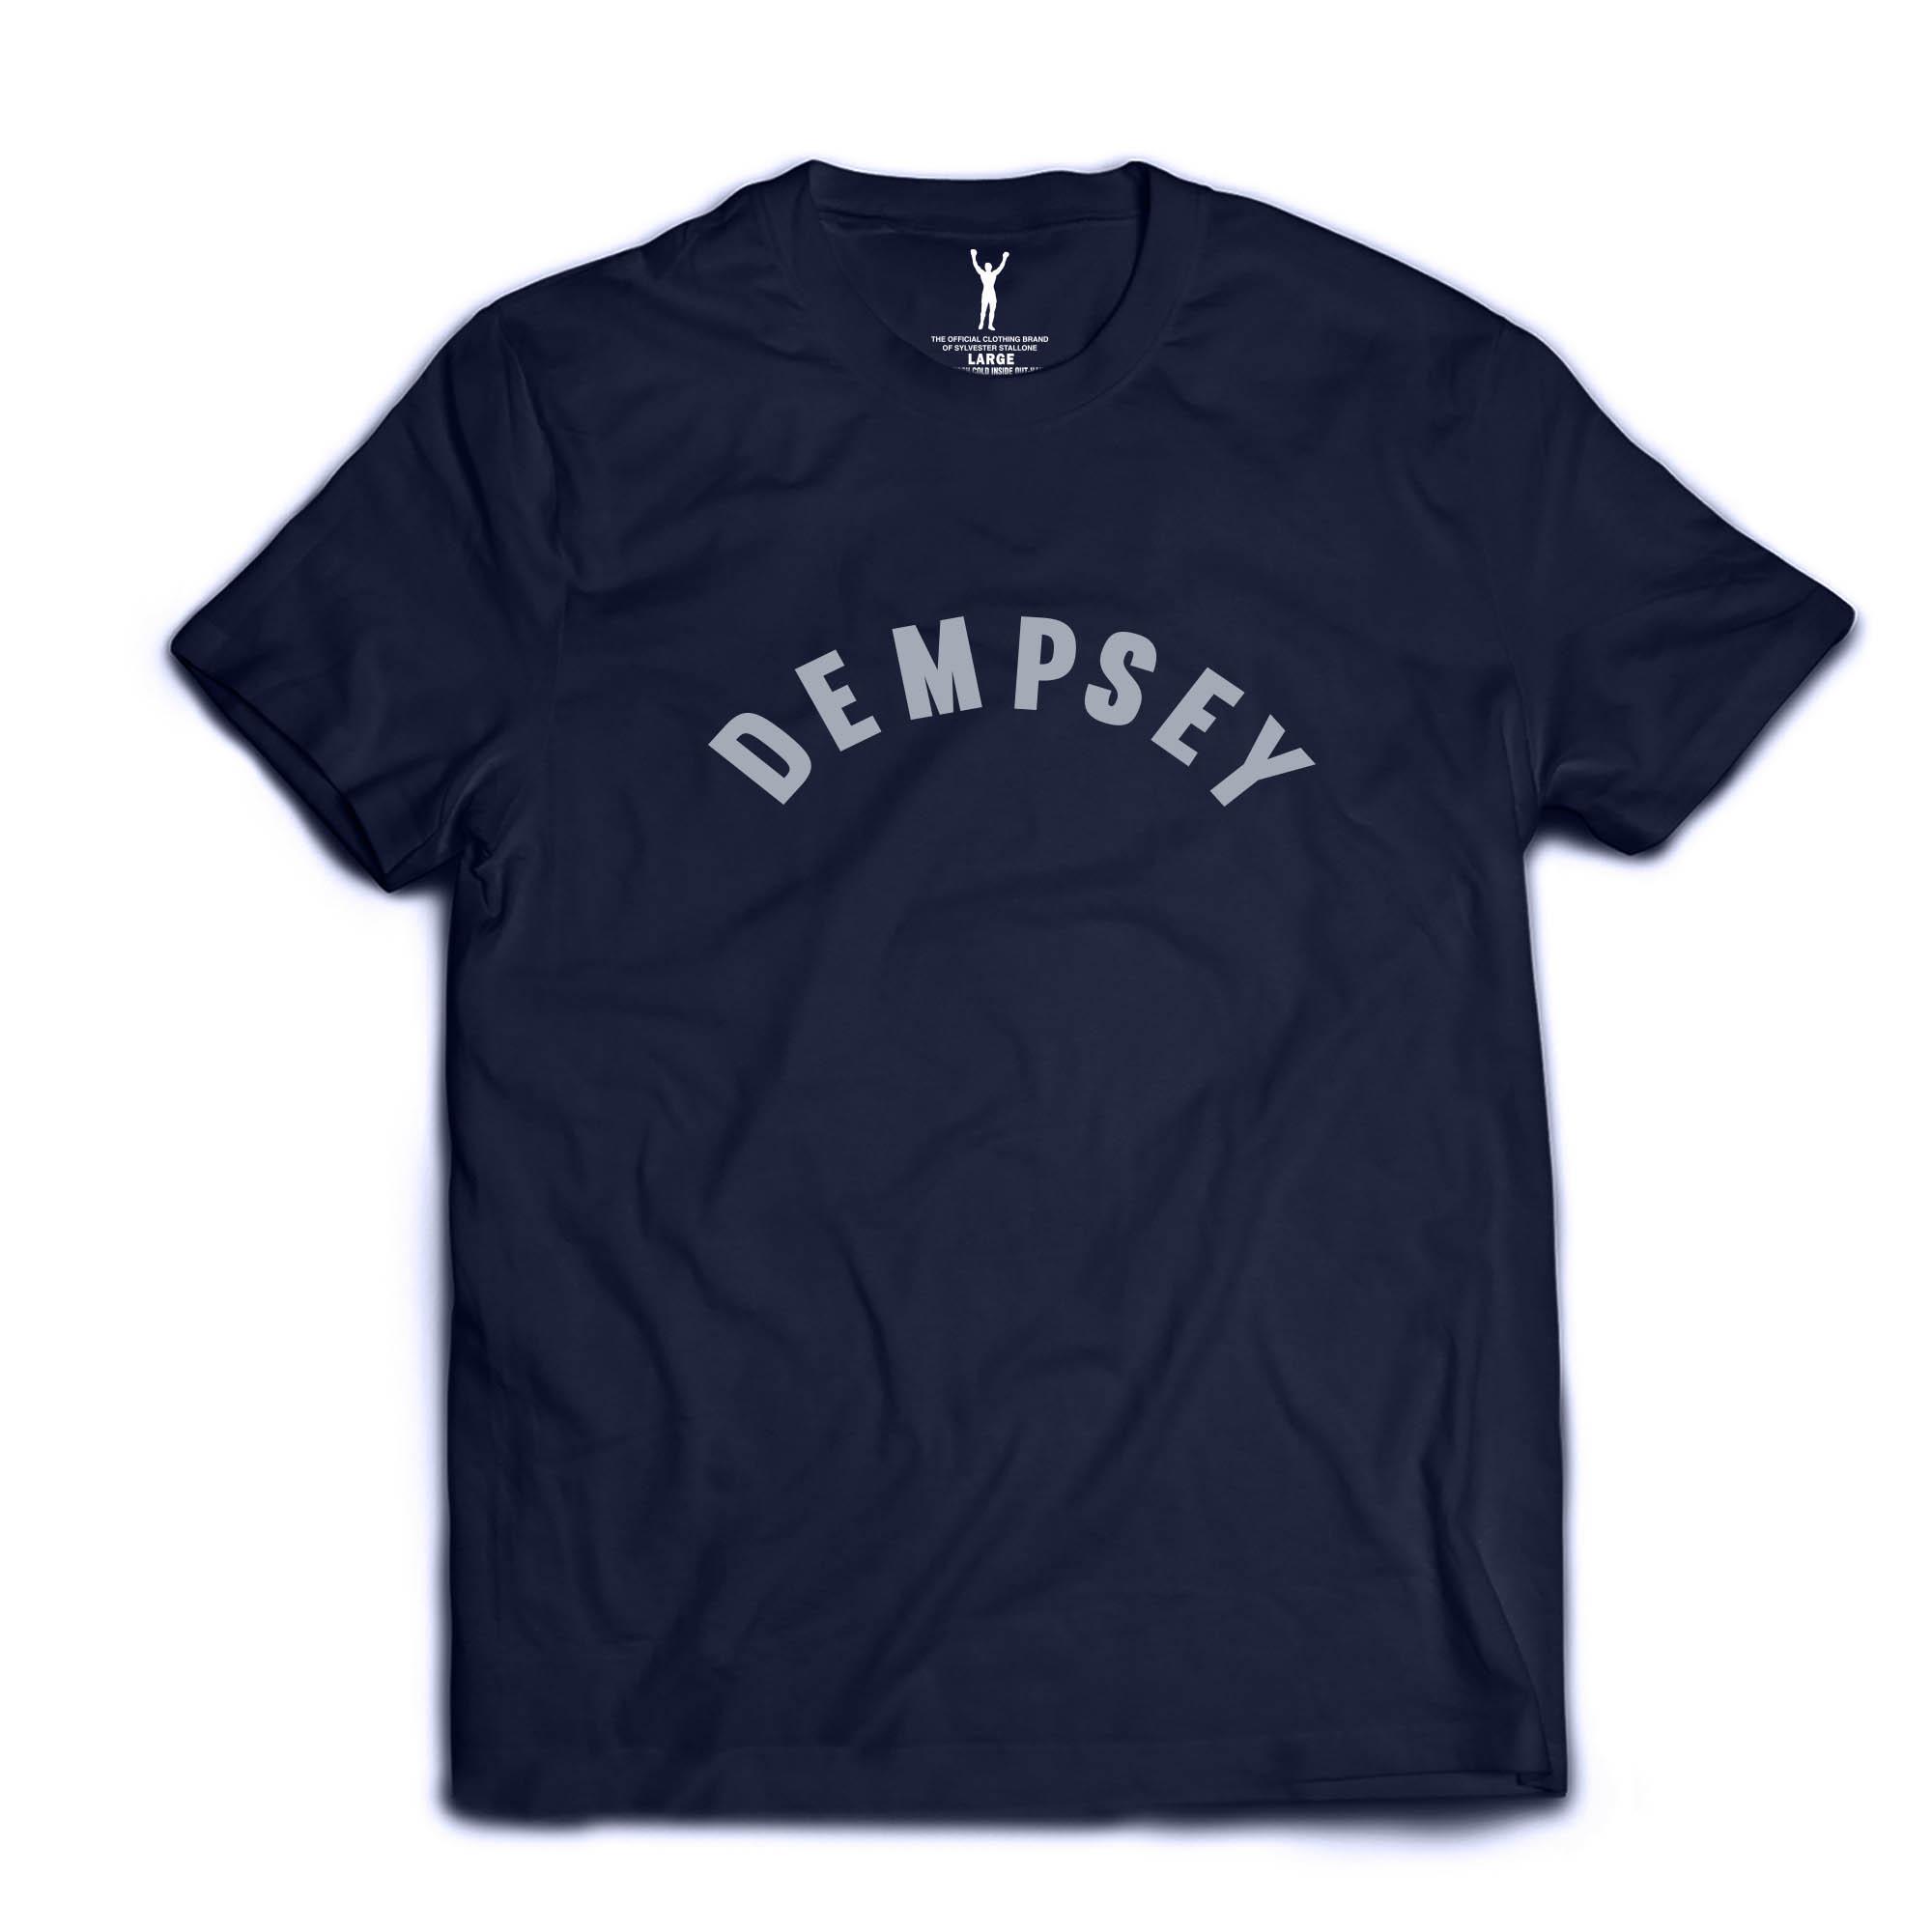 Dempsey Tee